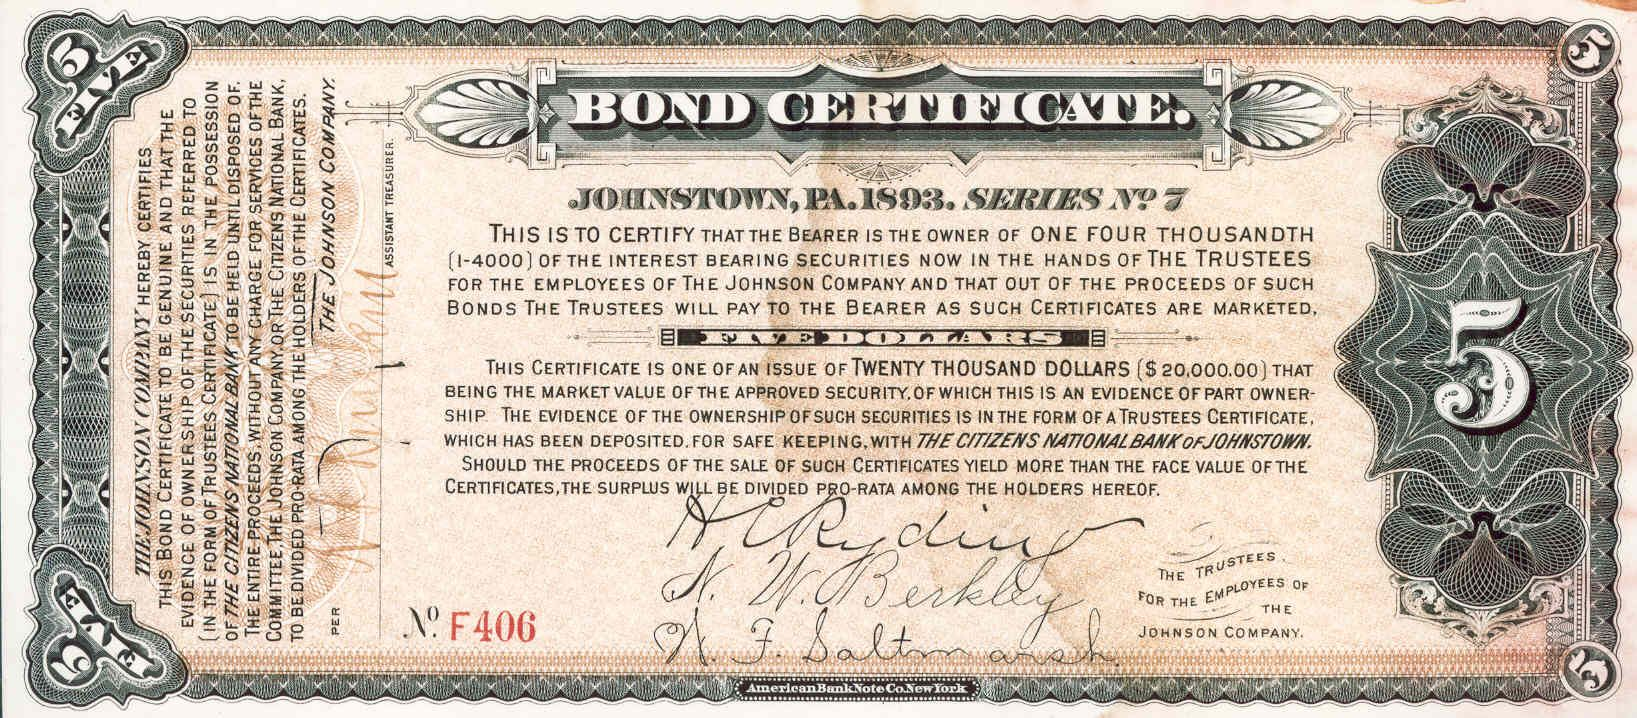 Old bond certificate example bonde